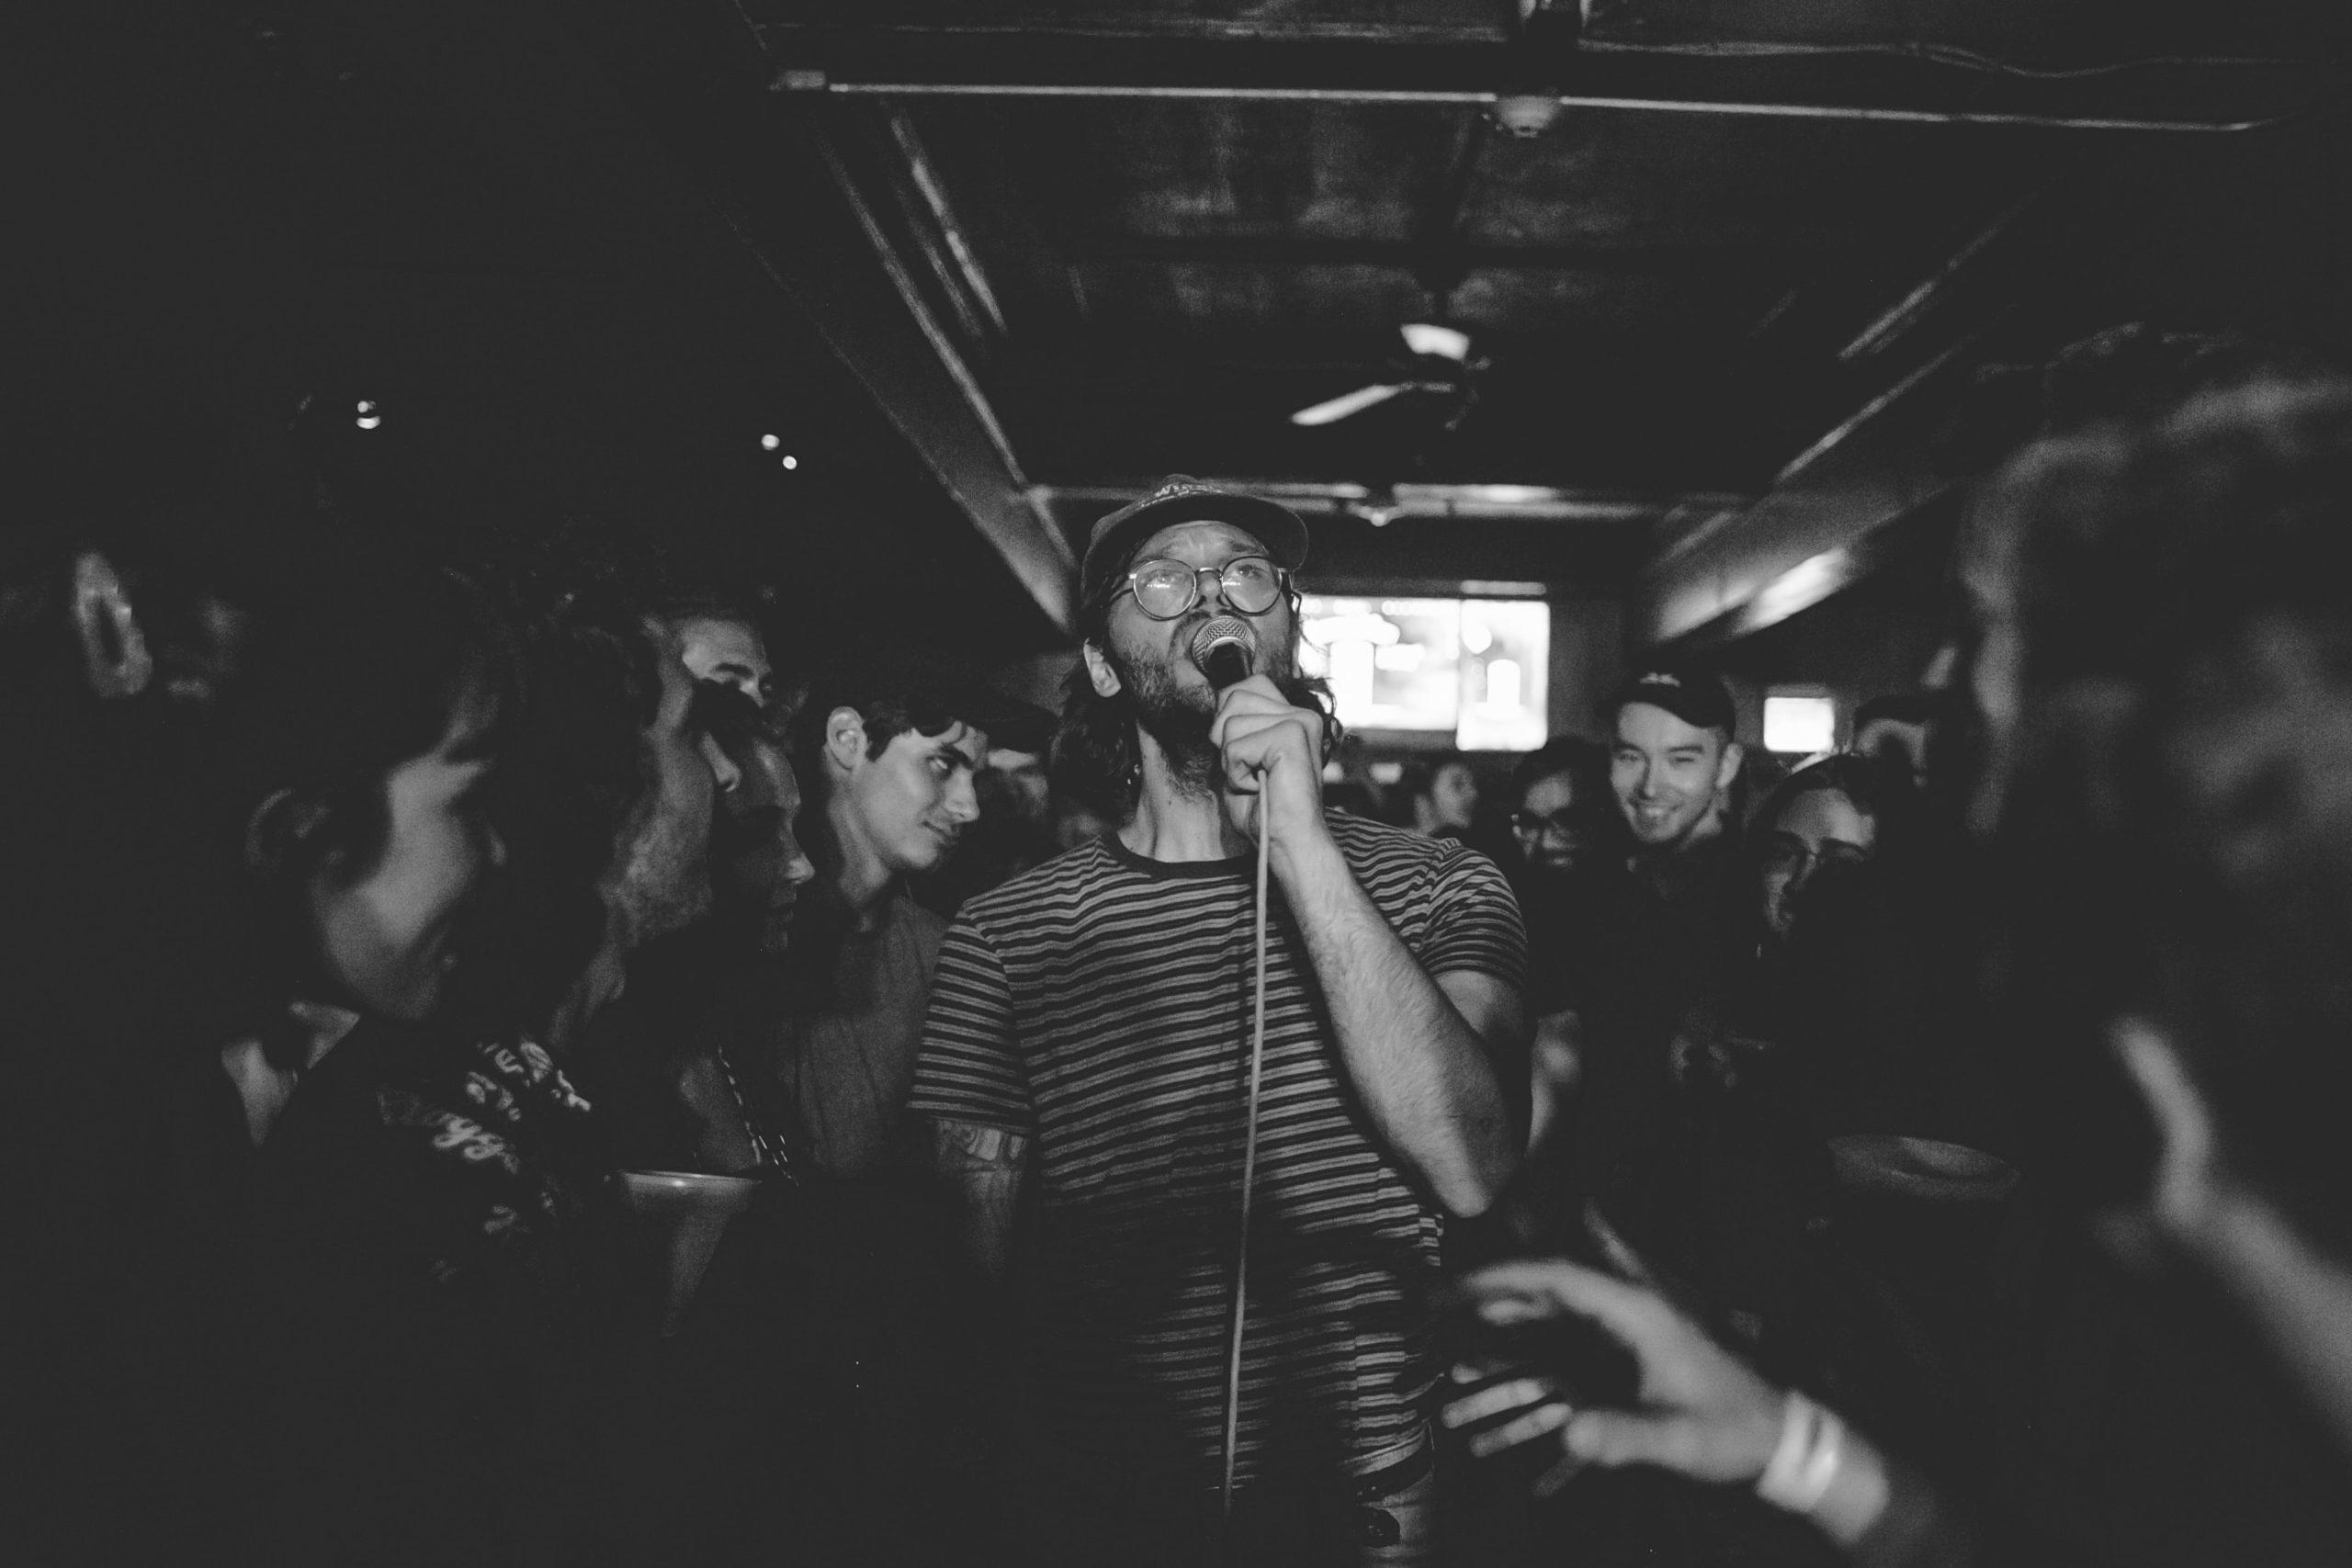 karaoke hacks gadgets reviews essentials amazon walmart